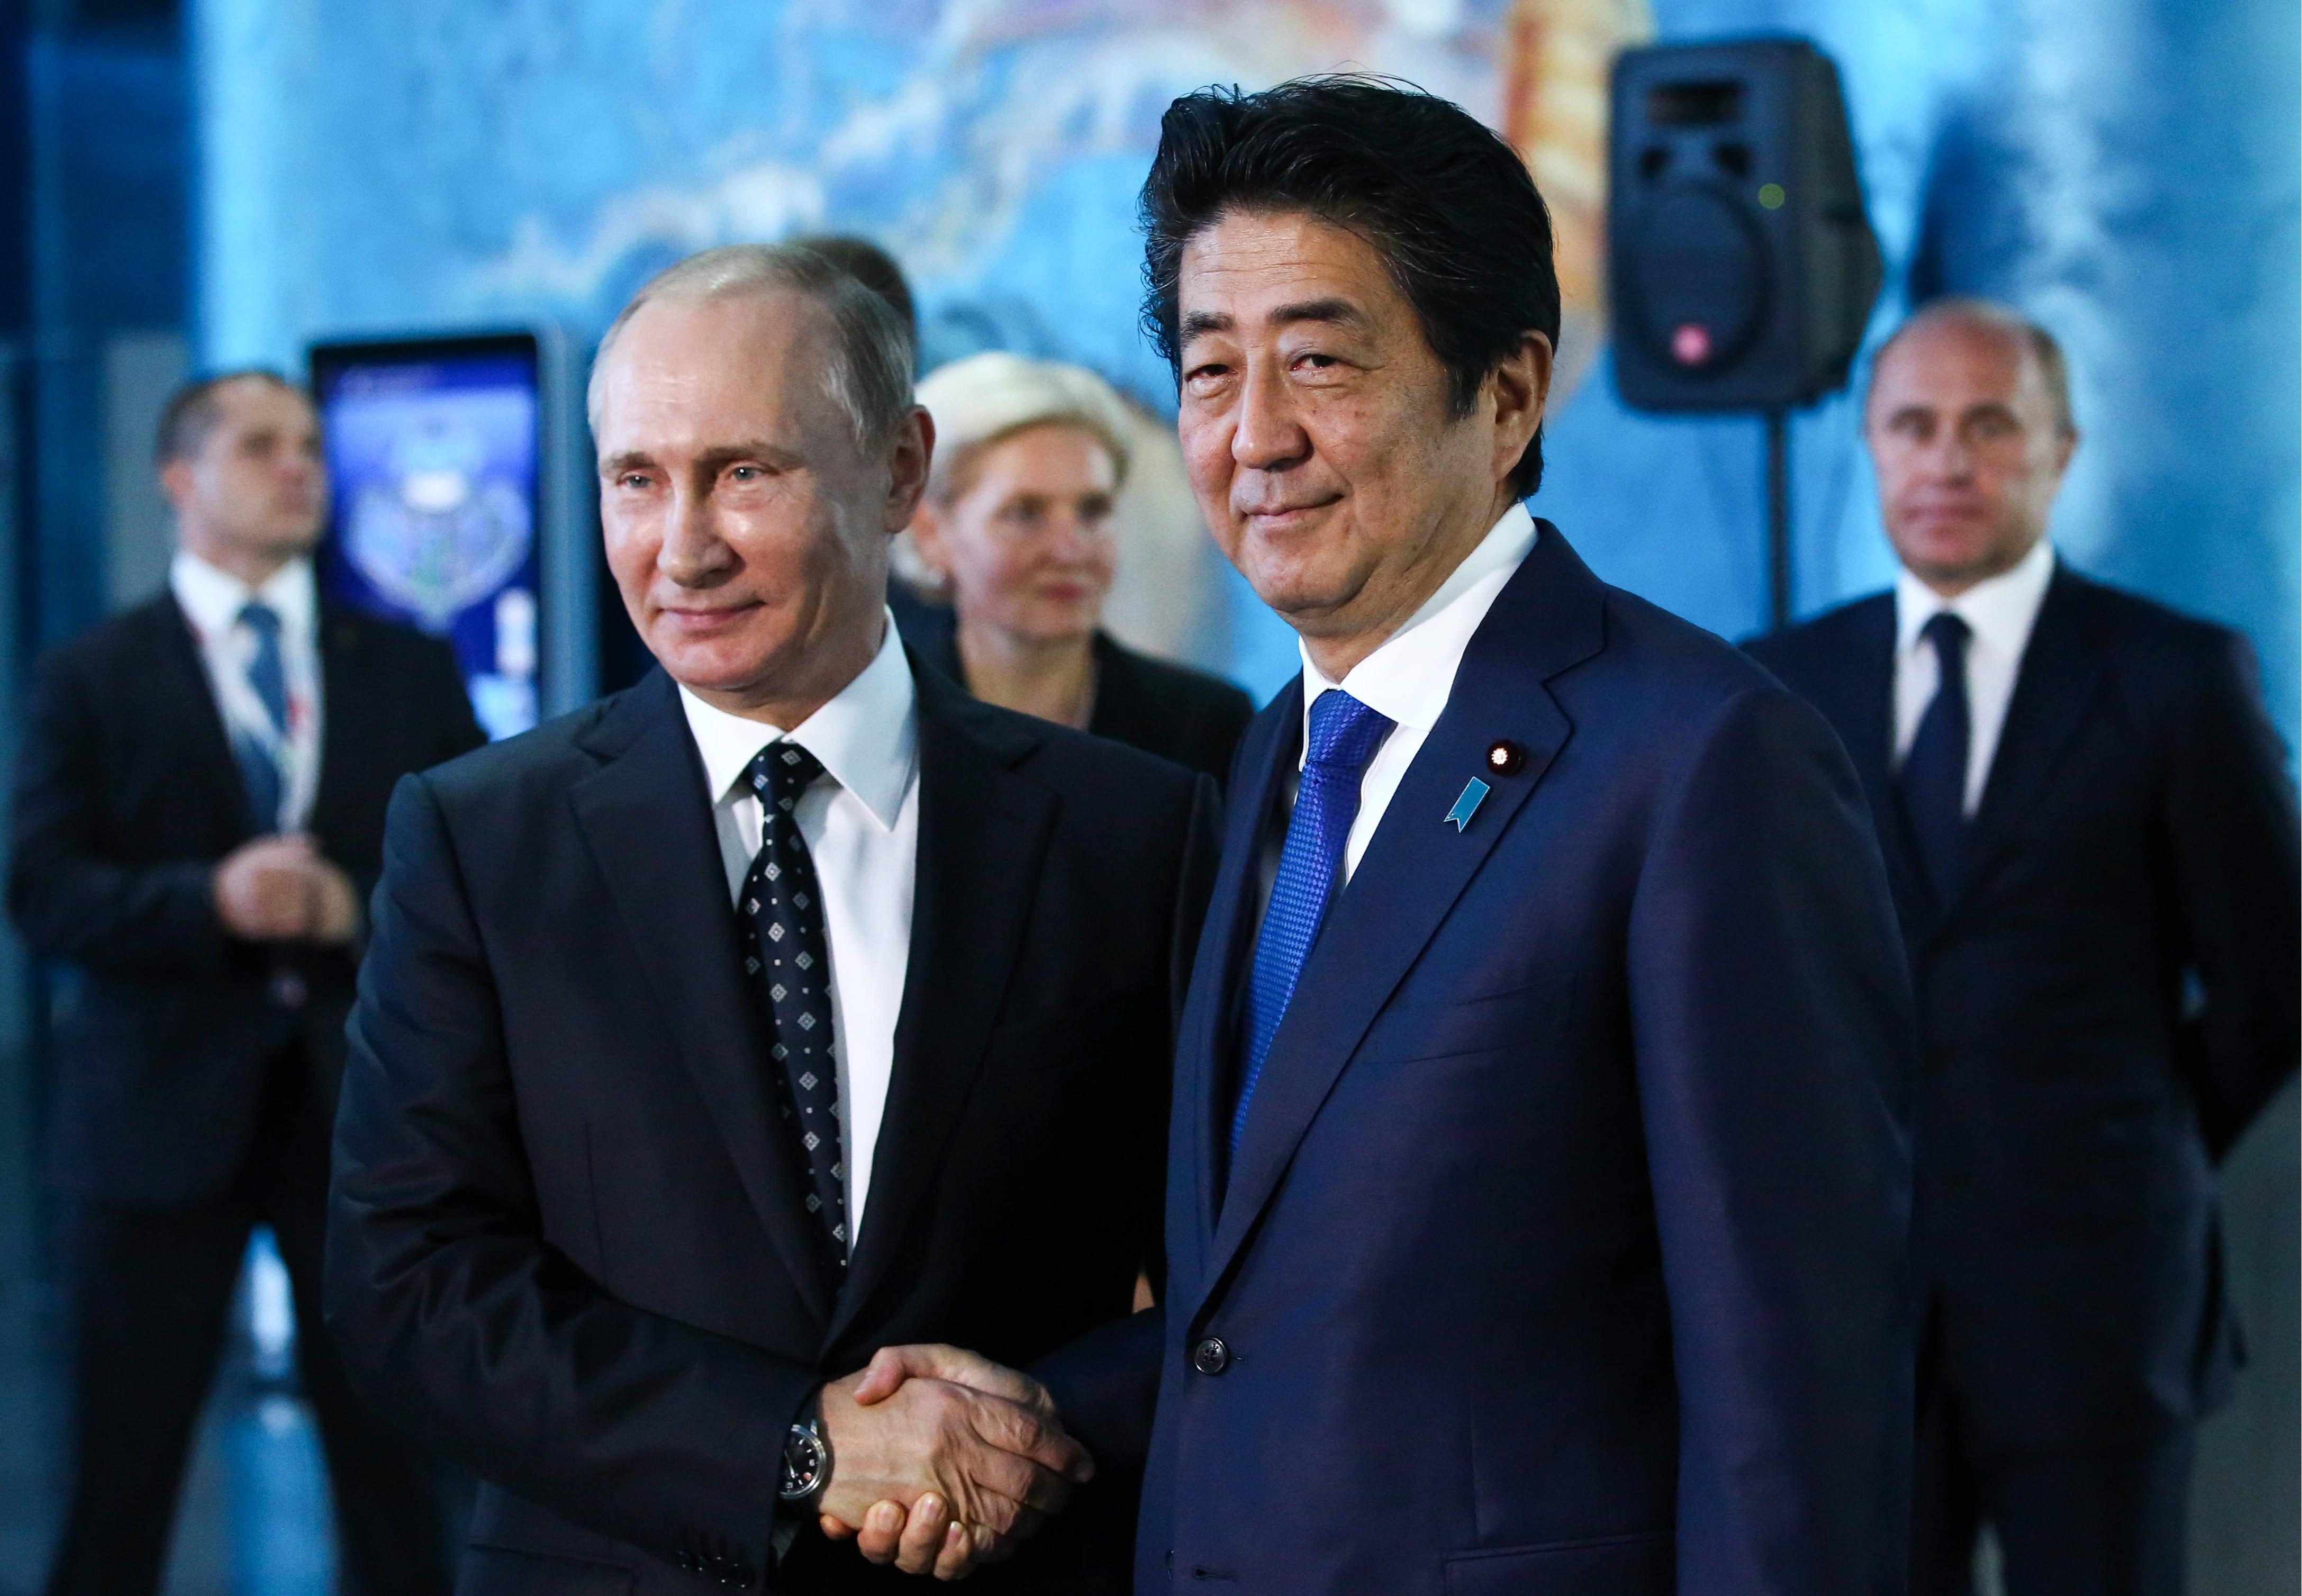 Russian President Vladimir Putin and Japanese Prime Minister Shinzo Abe at the Eastern Economic Forum in the Russian city of Vladivostok.